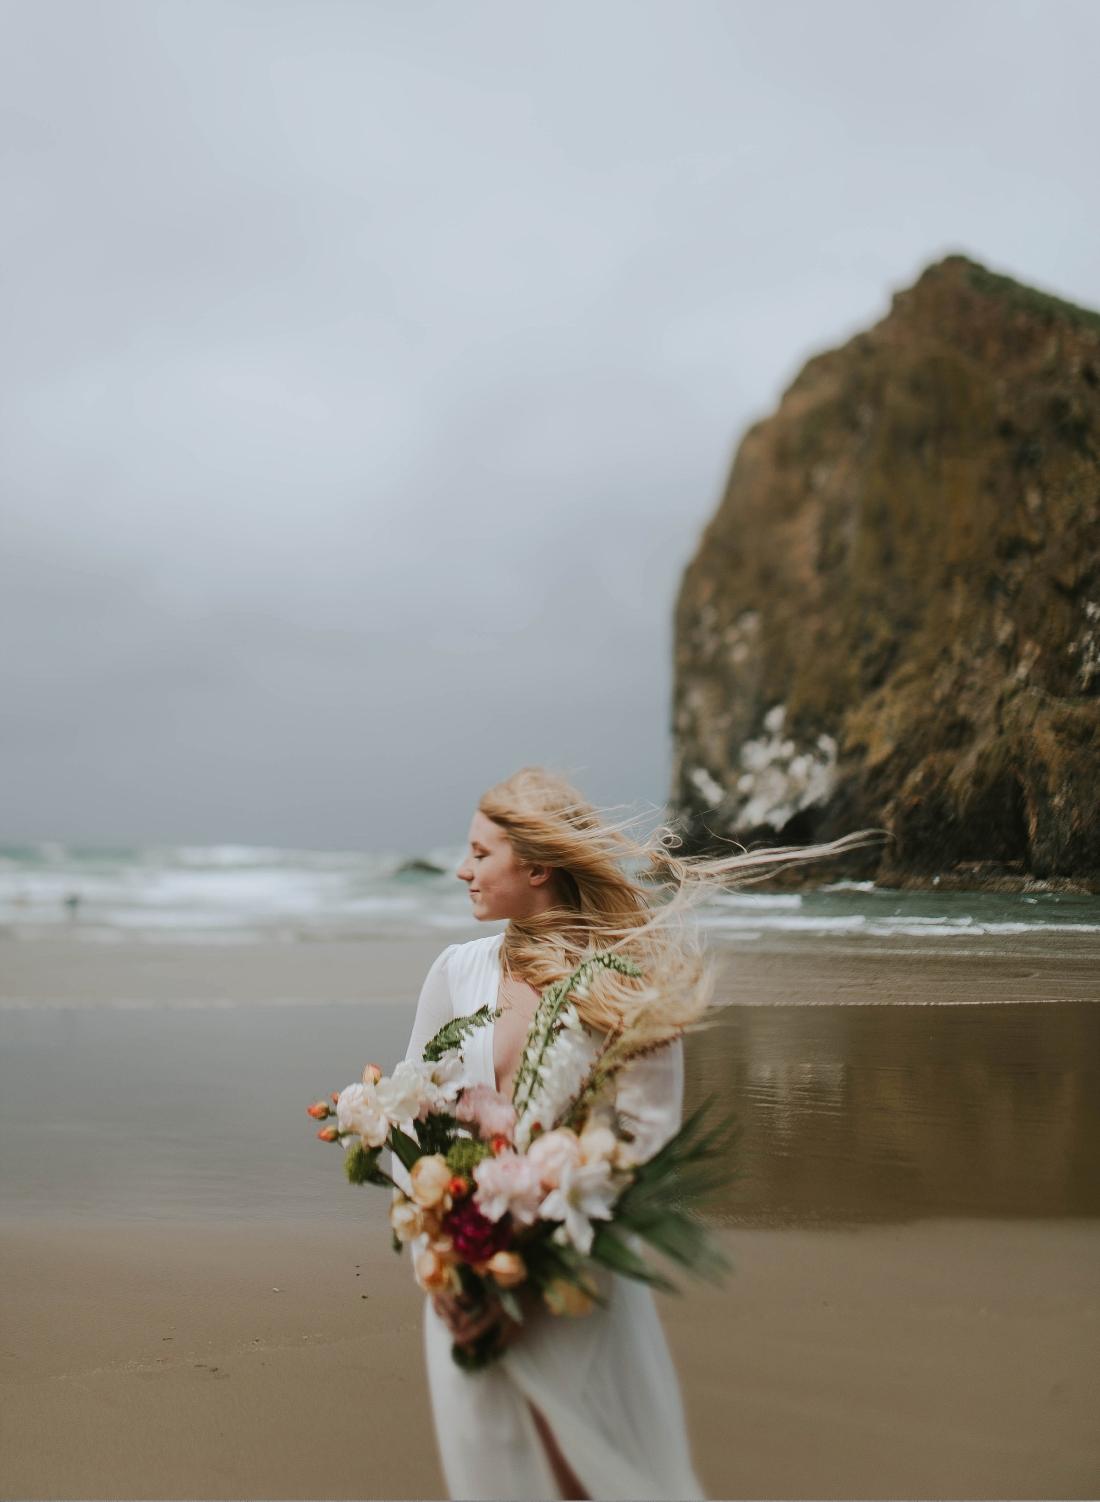 Couples on a beach Adri de la cruz Chicago intimate wedding photographer (8)